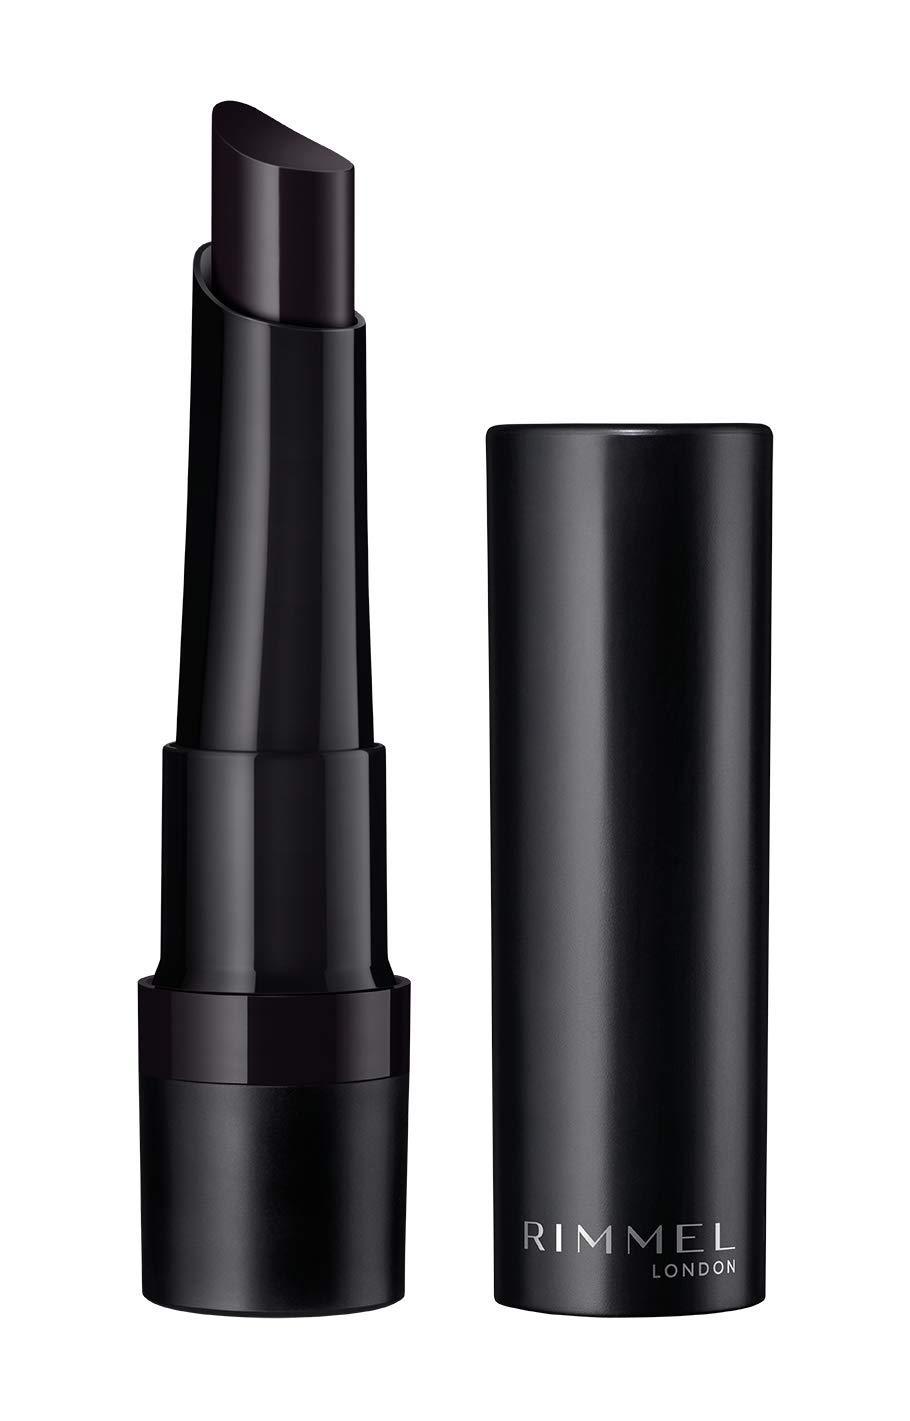 Rimmel Lasting Finish Extreme Lipstick in Off Black